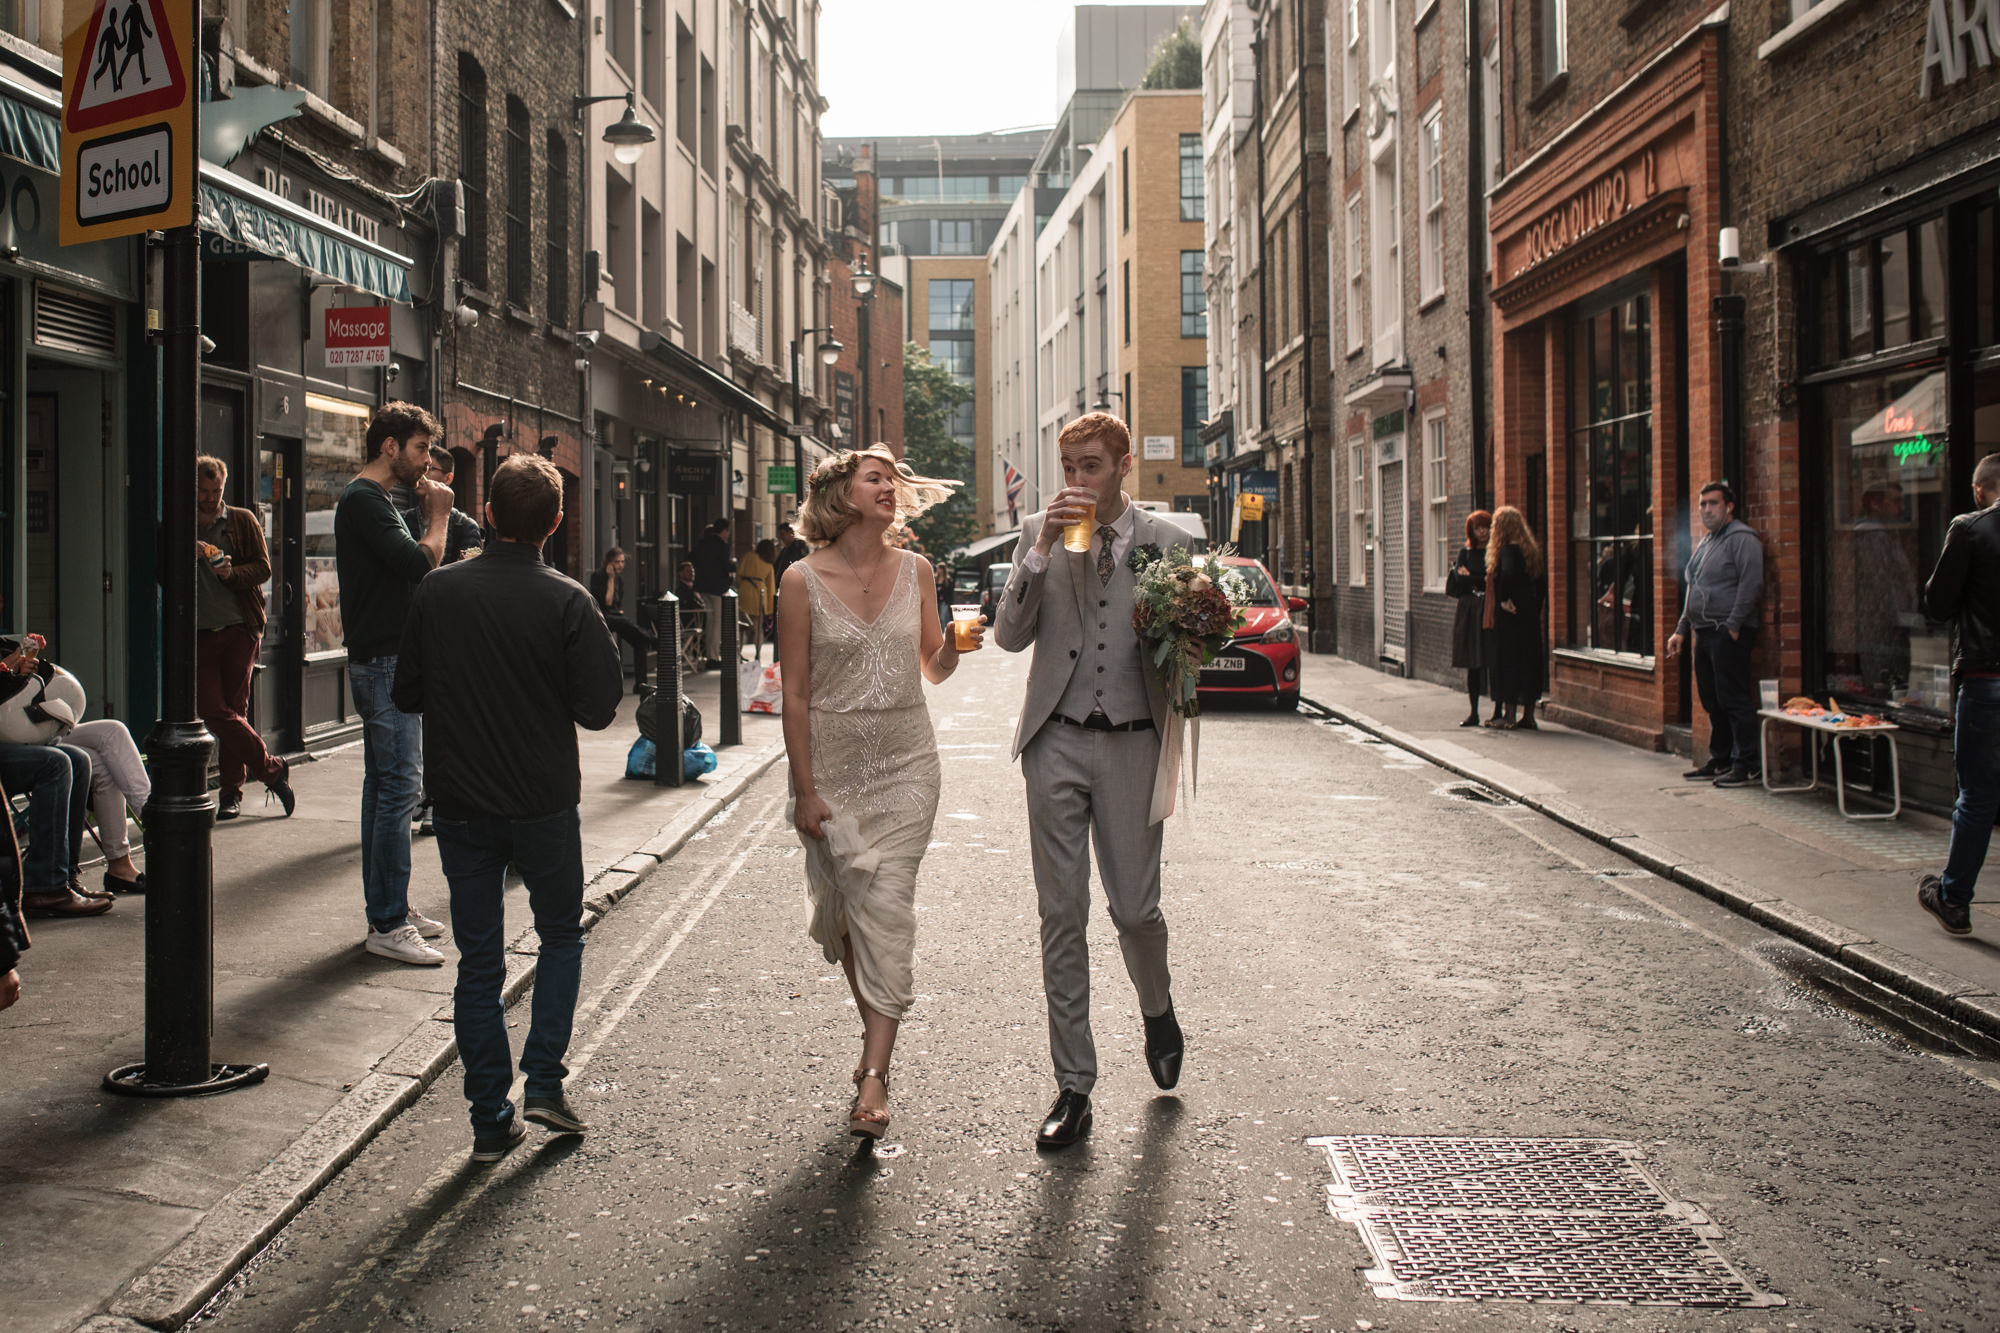 Choosing a wedding venue in London